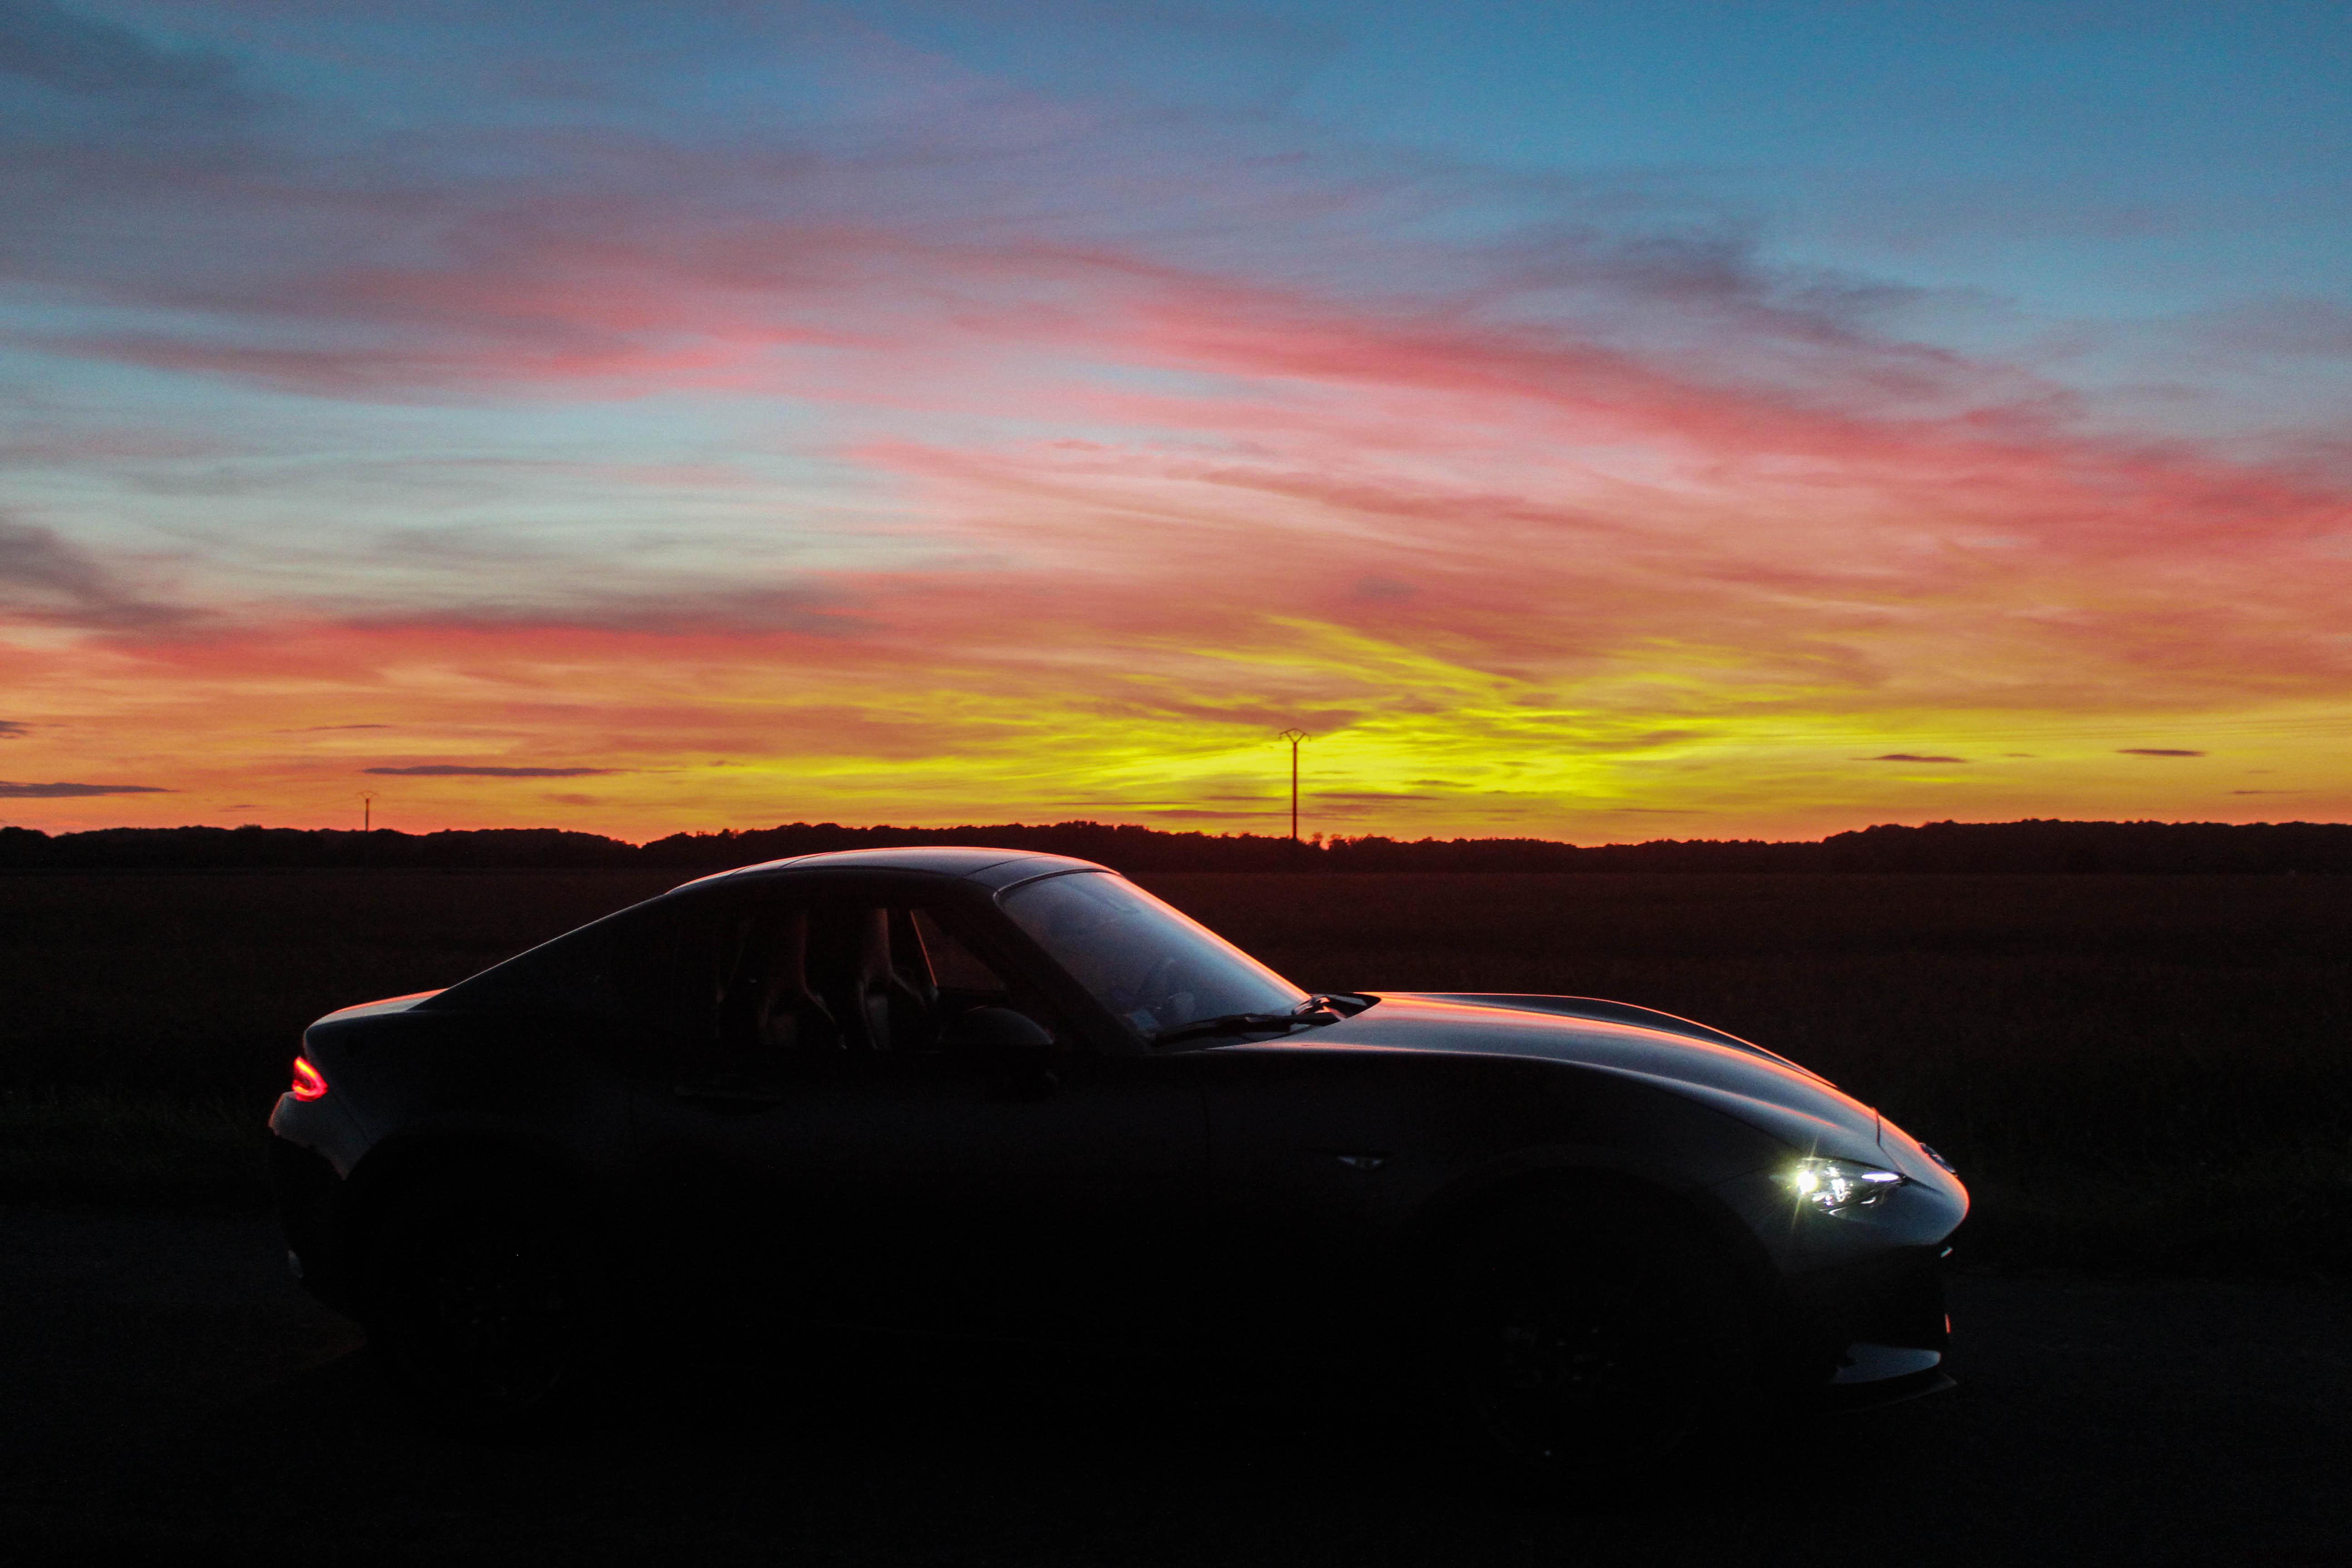 MazdaMX5RF35-mazda-mx5-rf-edition-profil-side-Arnaud Demasier-RSPhotographie